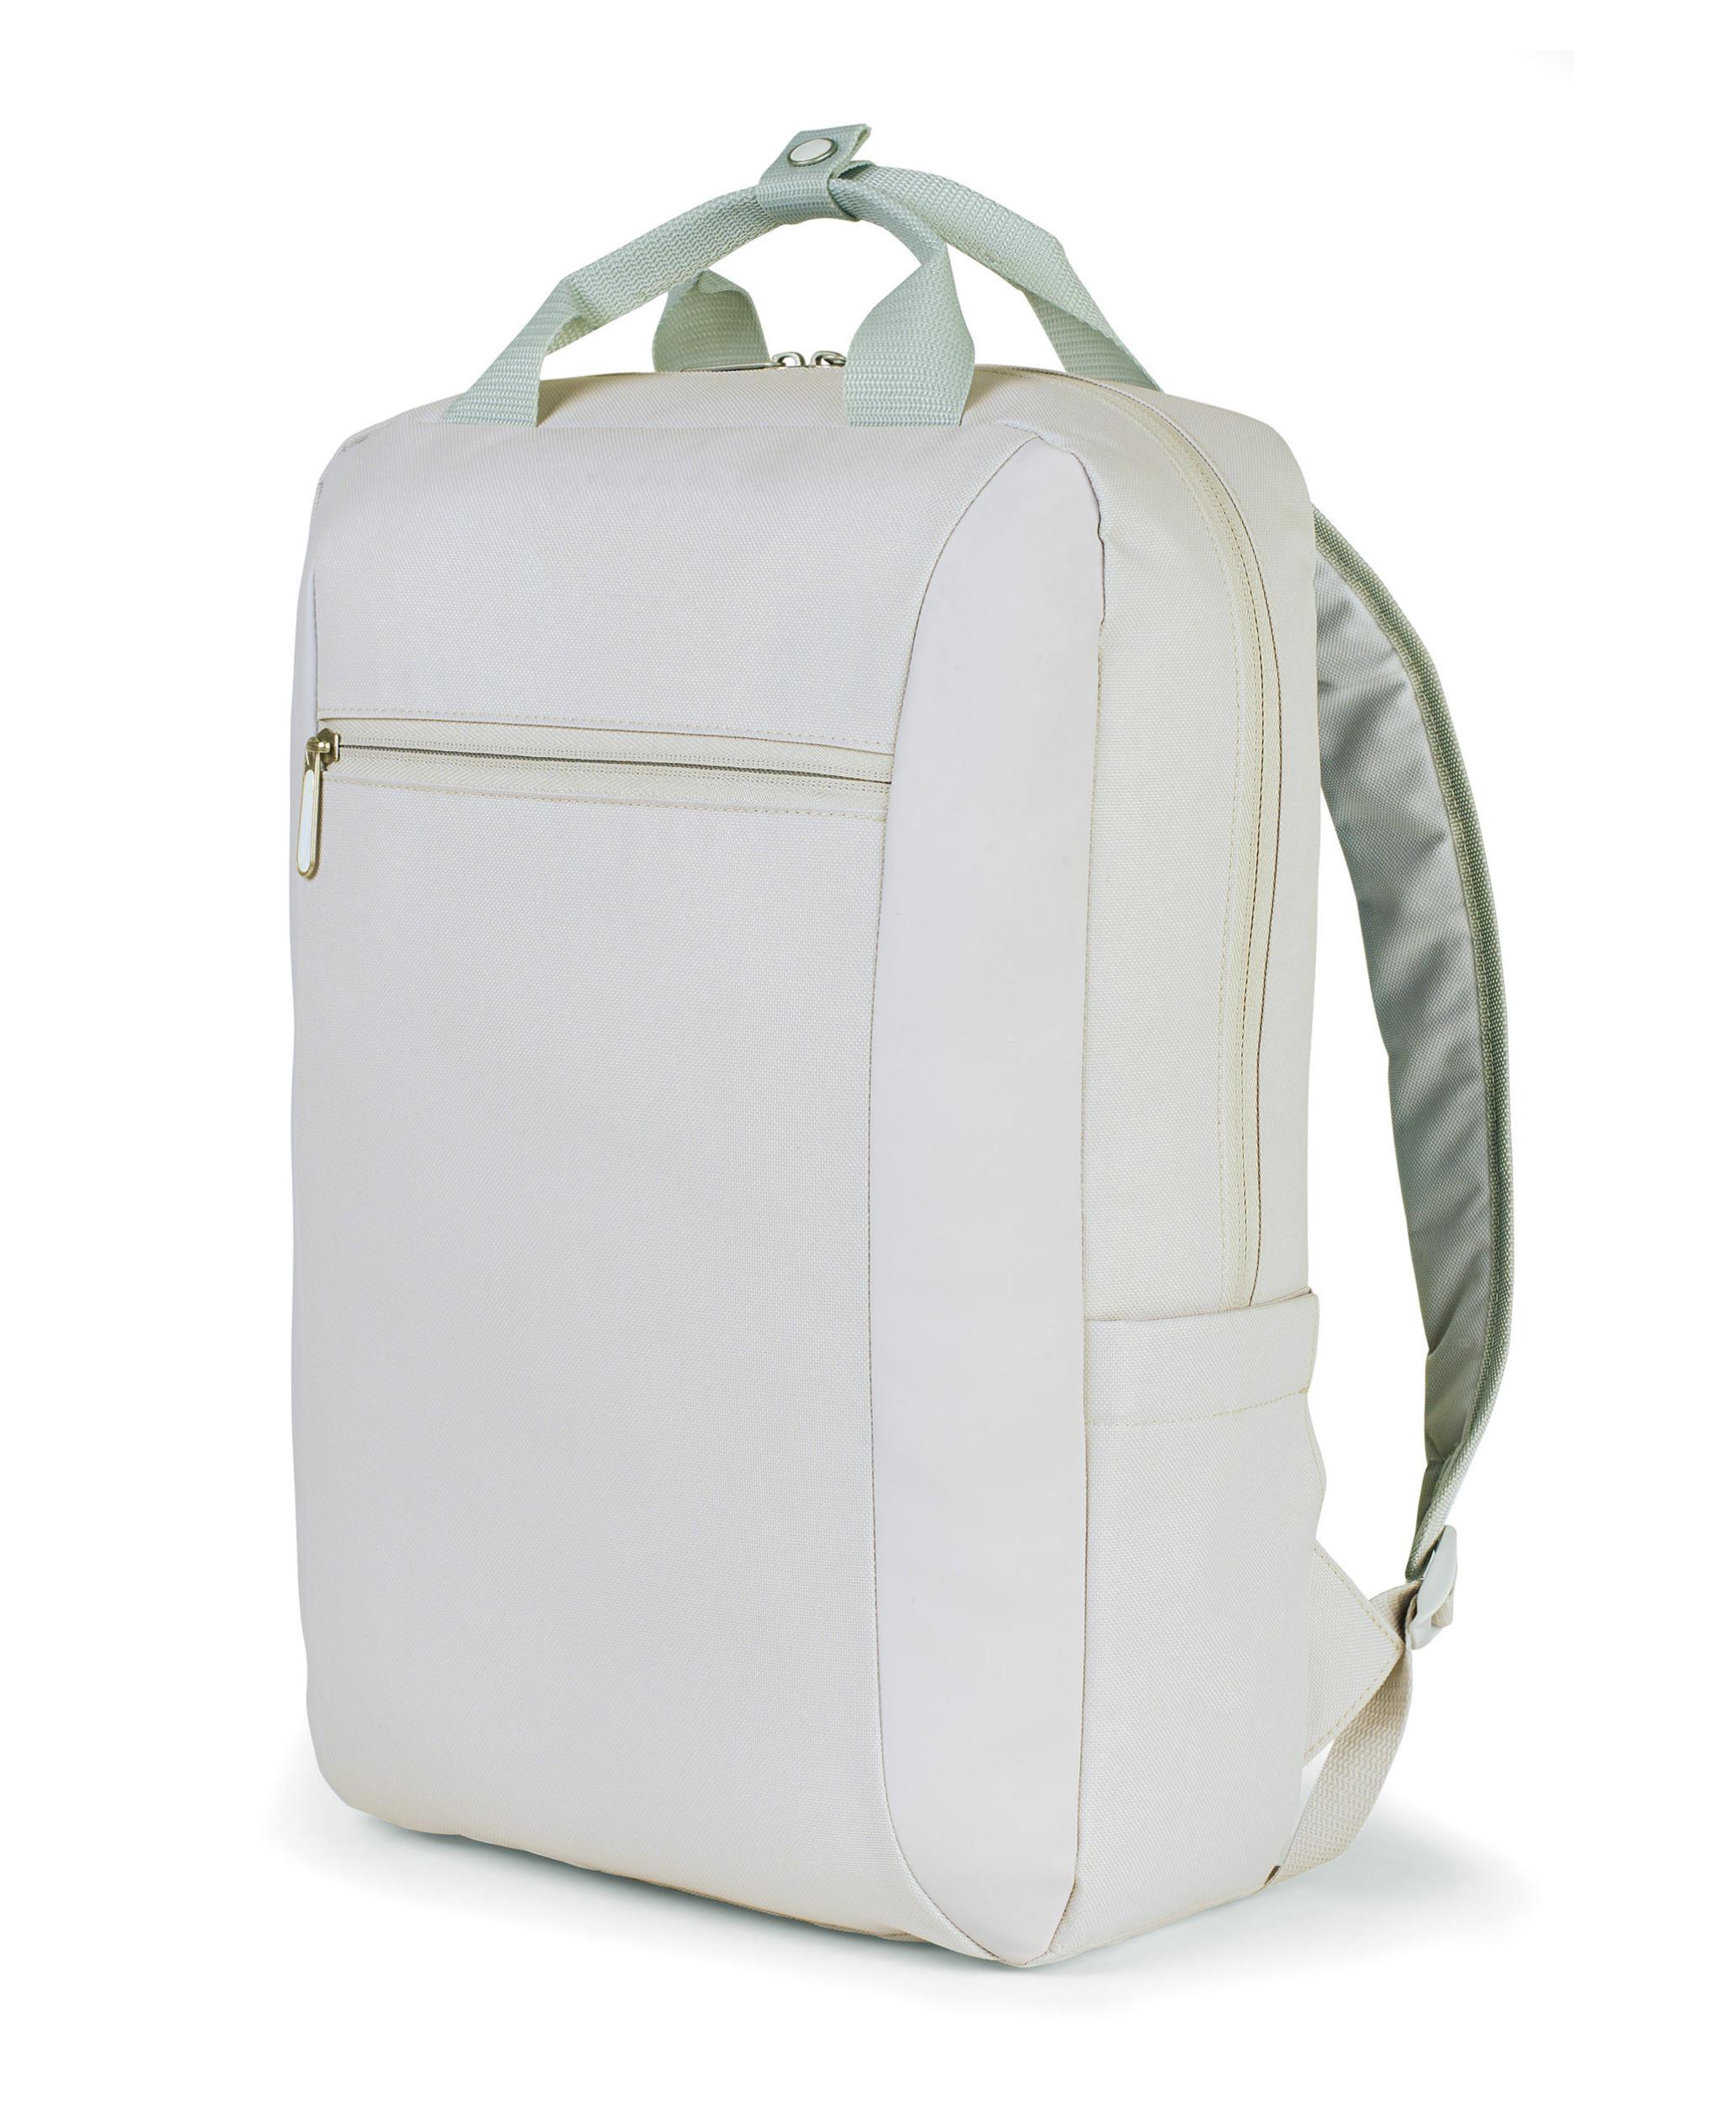 Gemline 100116 - Blake Computer Backpack